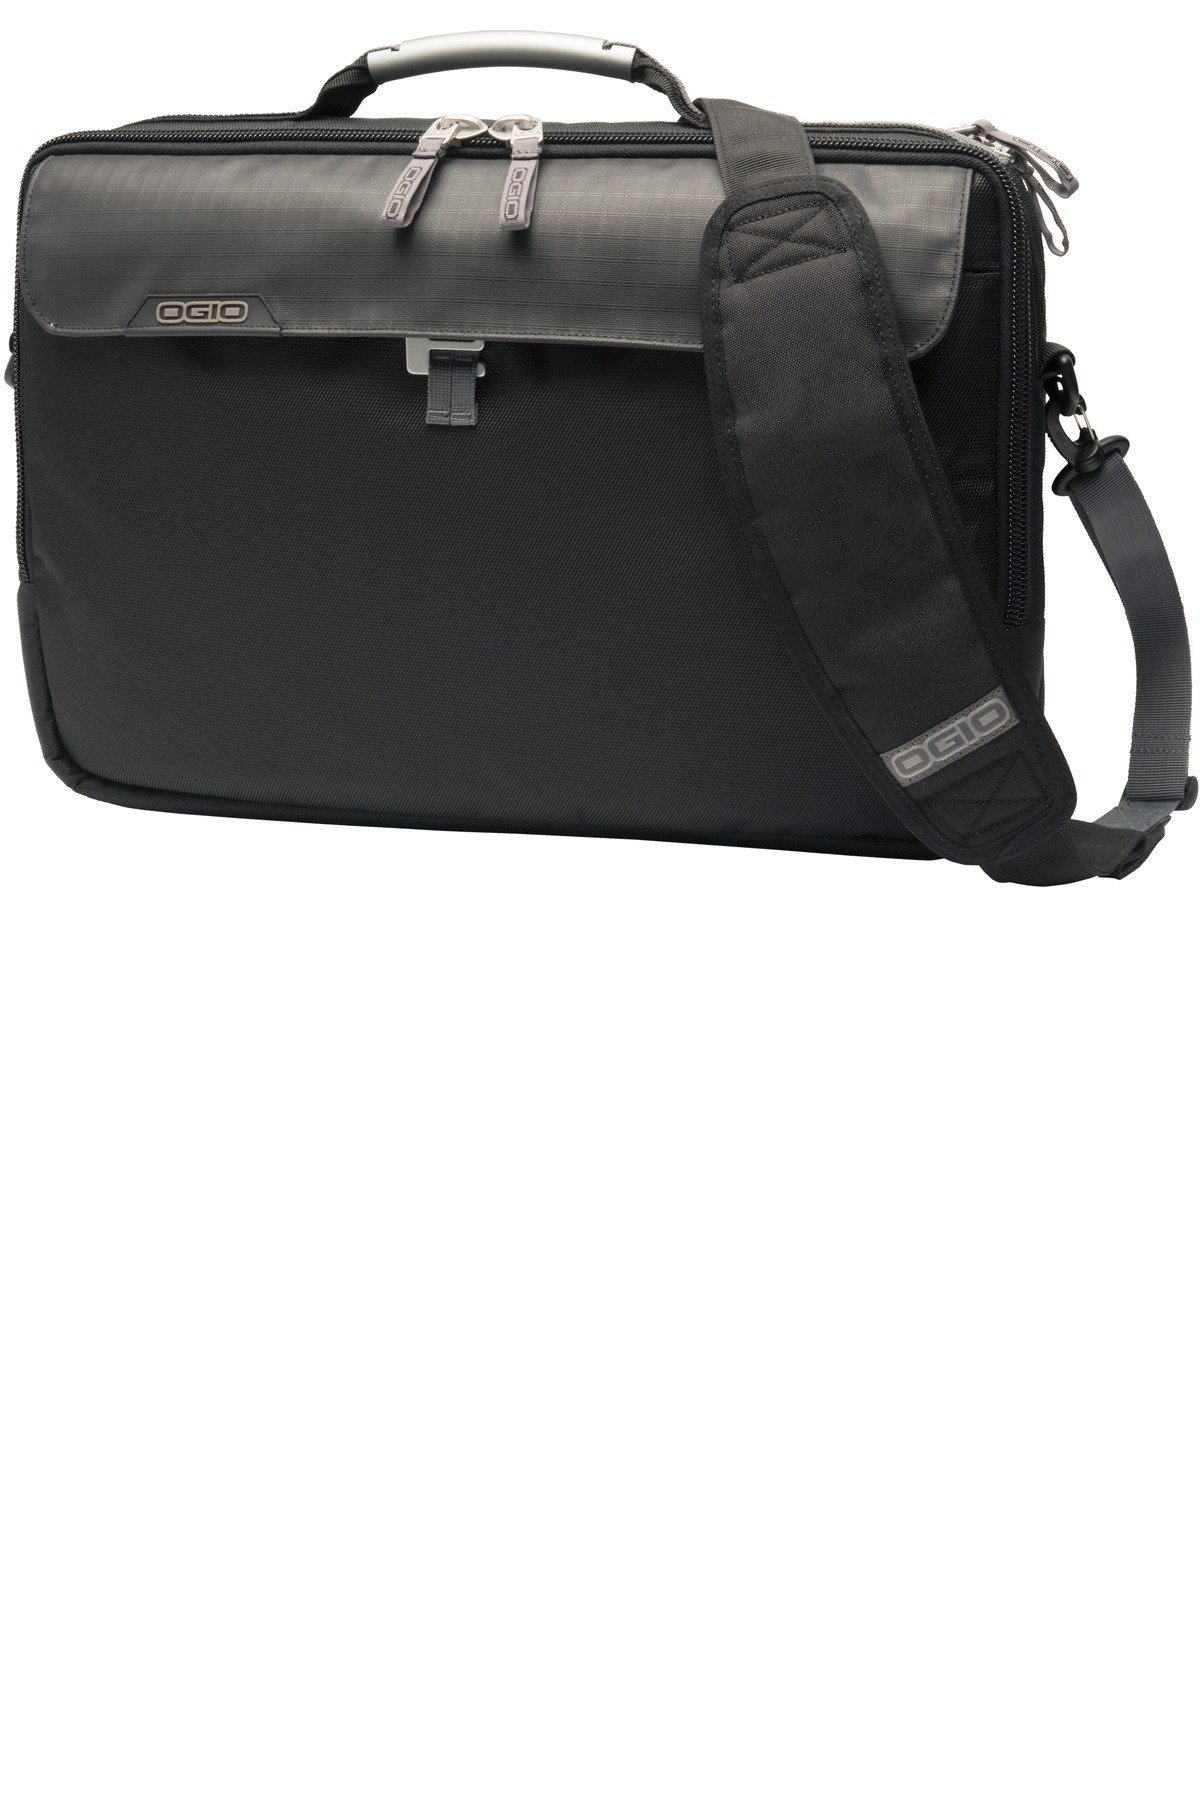 OGIO 417053 Pursuit Messenger Bag, Black